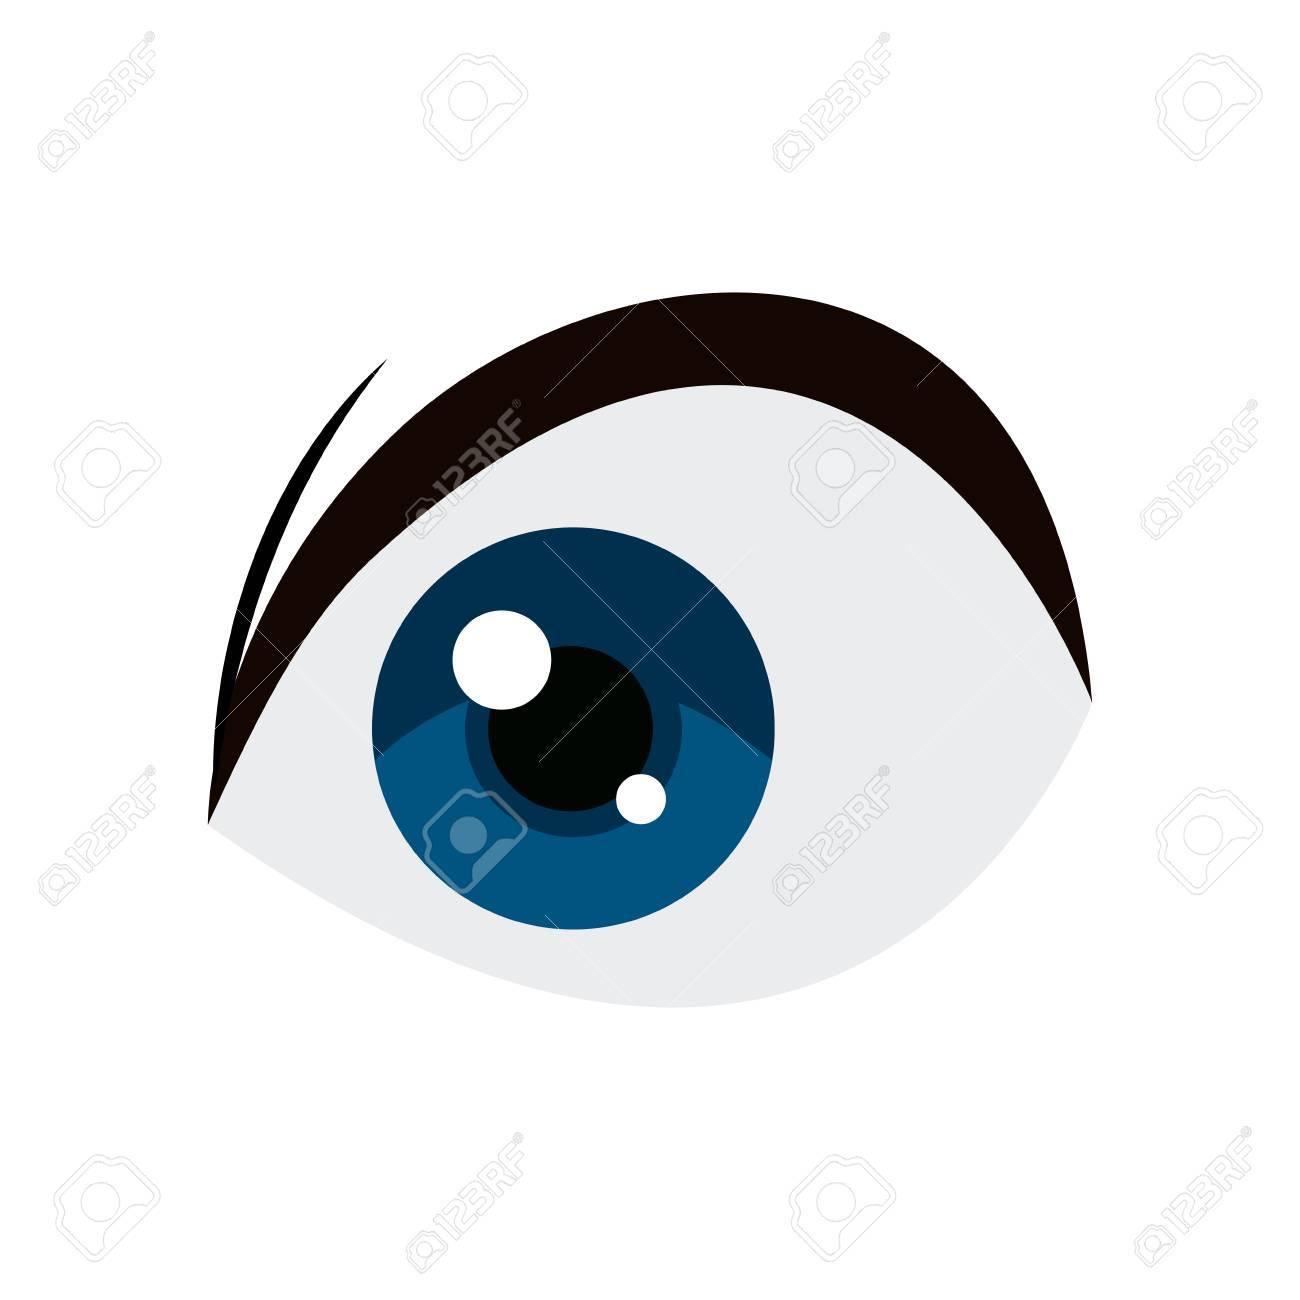 anime blue eye comic manga image vector illustration royalty free rh 123rf com eyeball vector free download eyeball vector free download